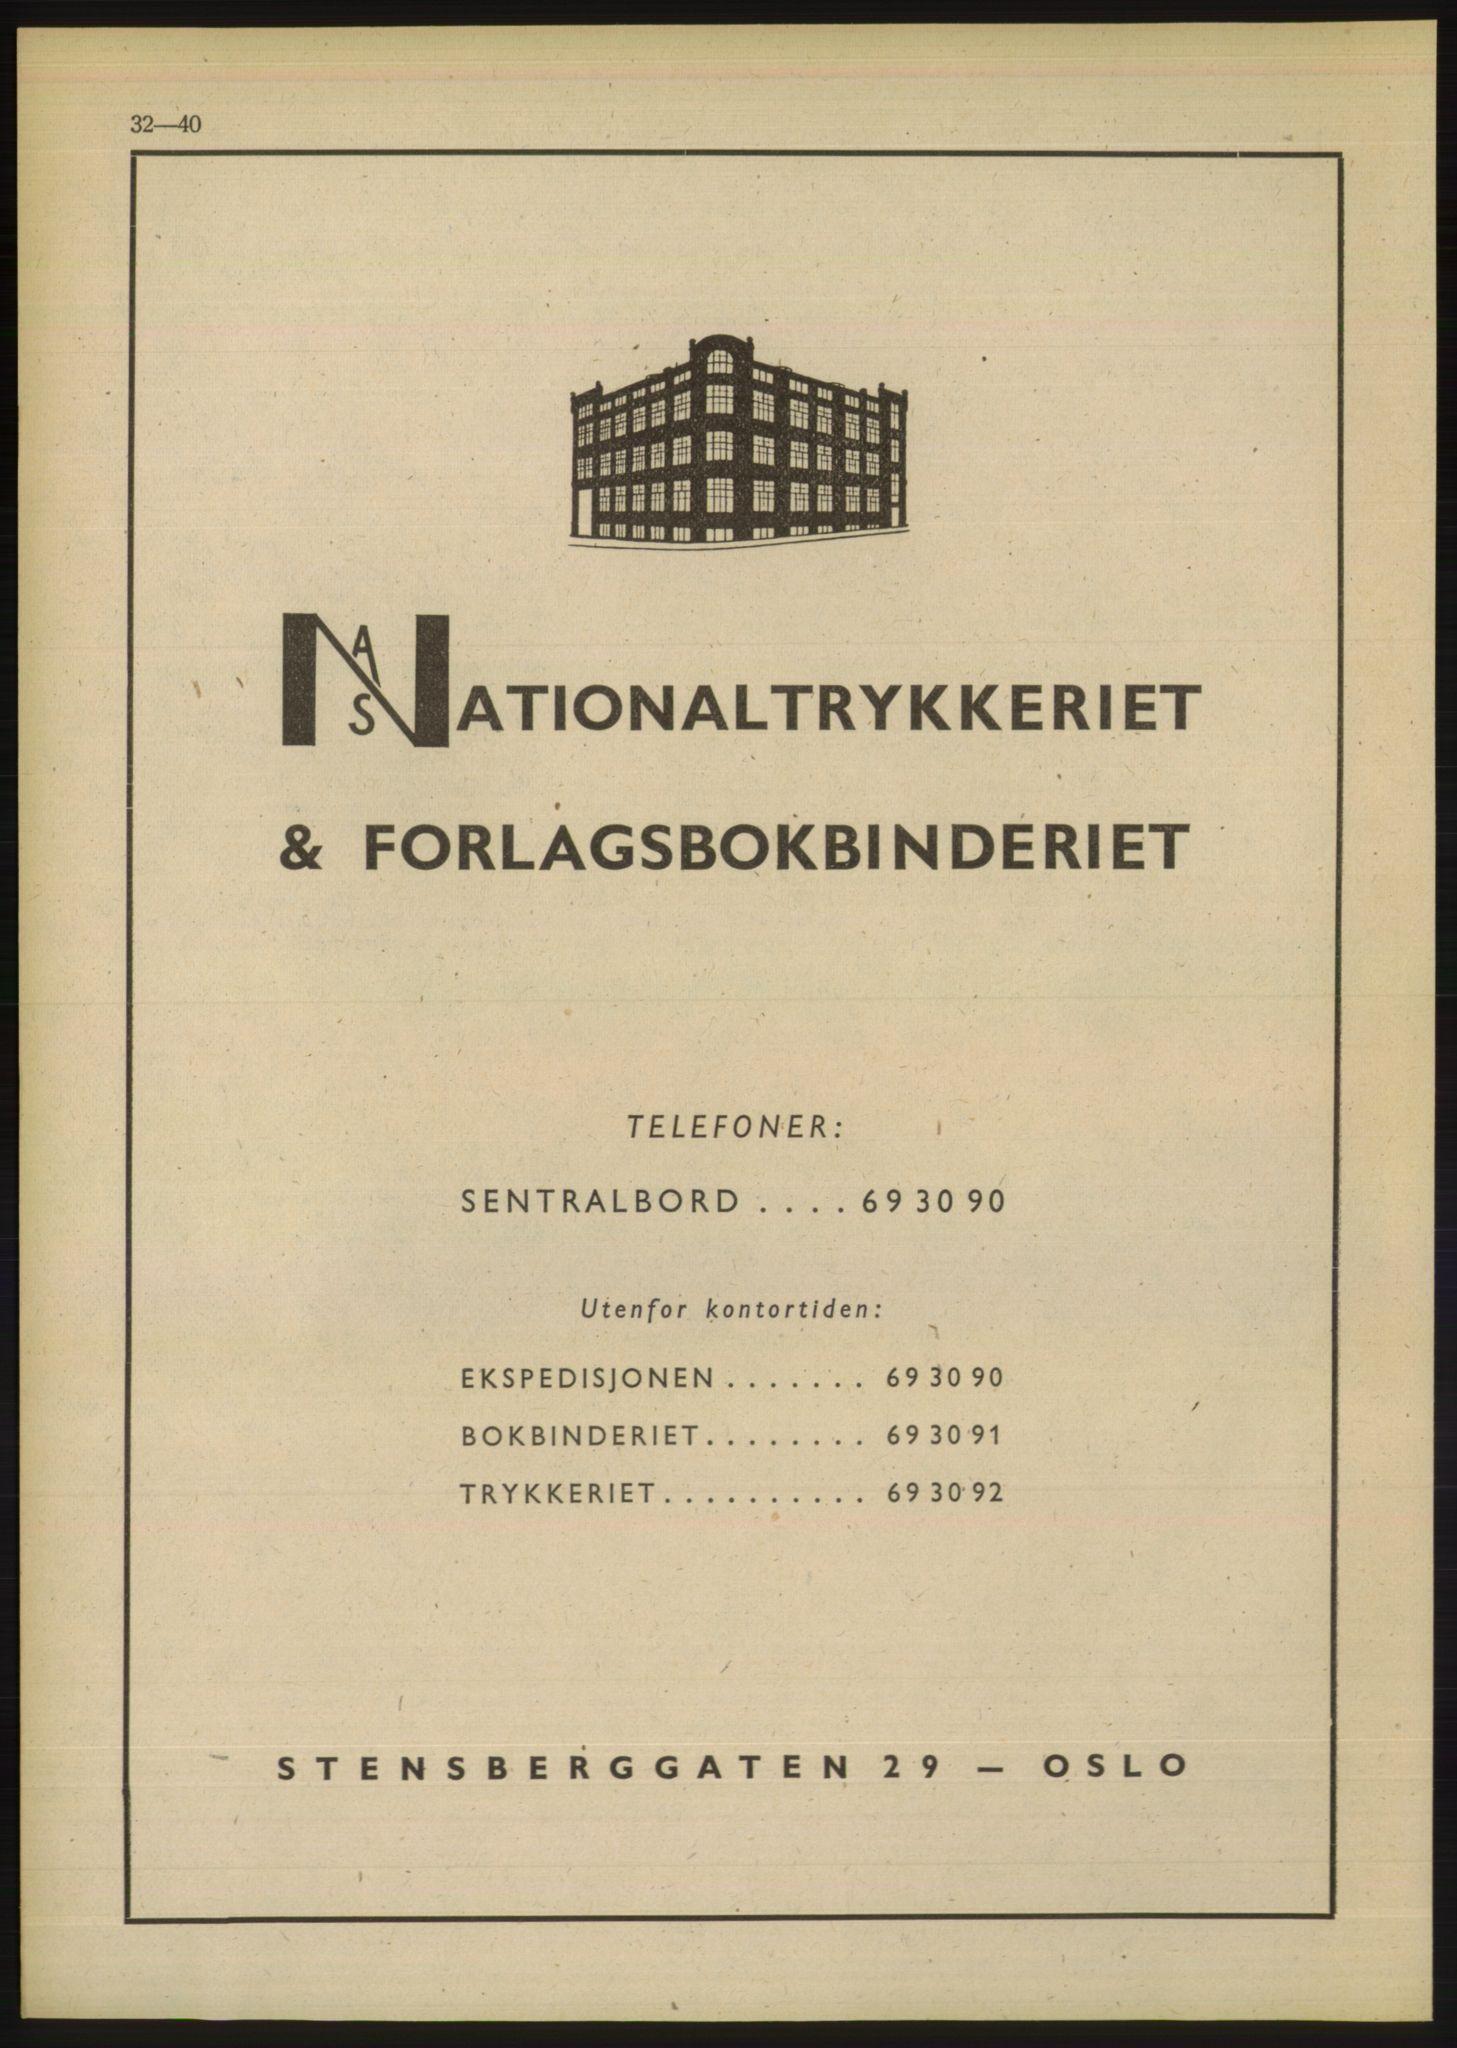 PUBL, Kristiania/Oslo adressebok, 1948, s. 32